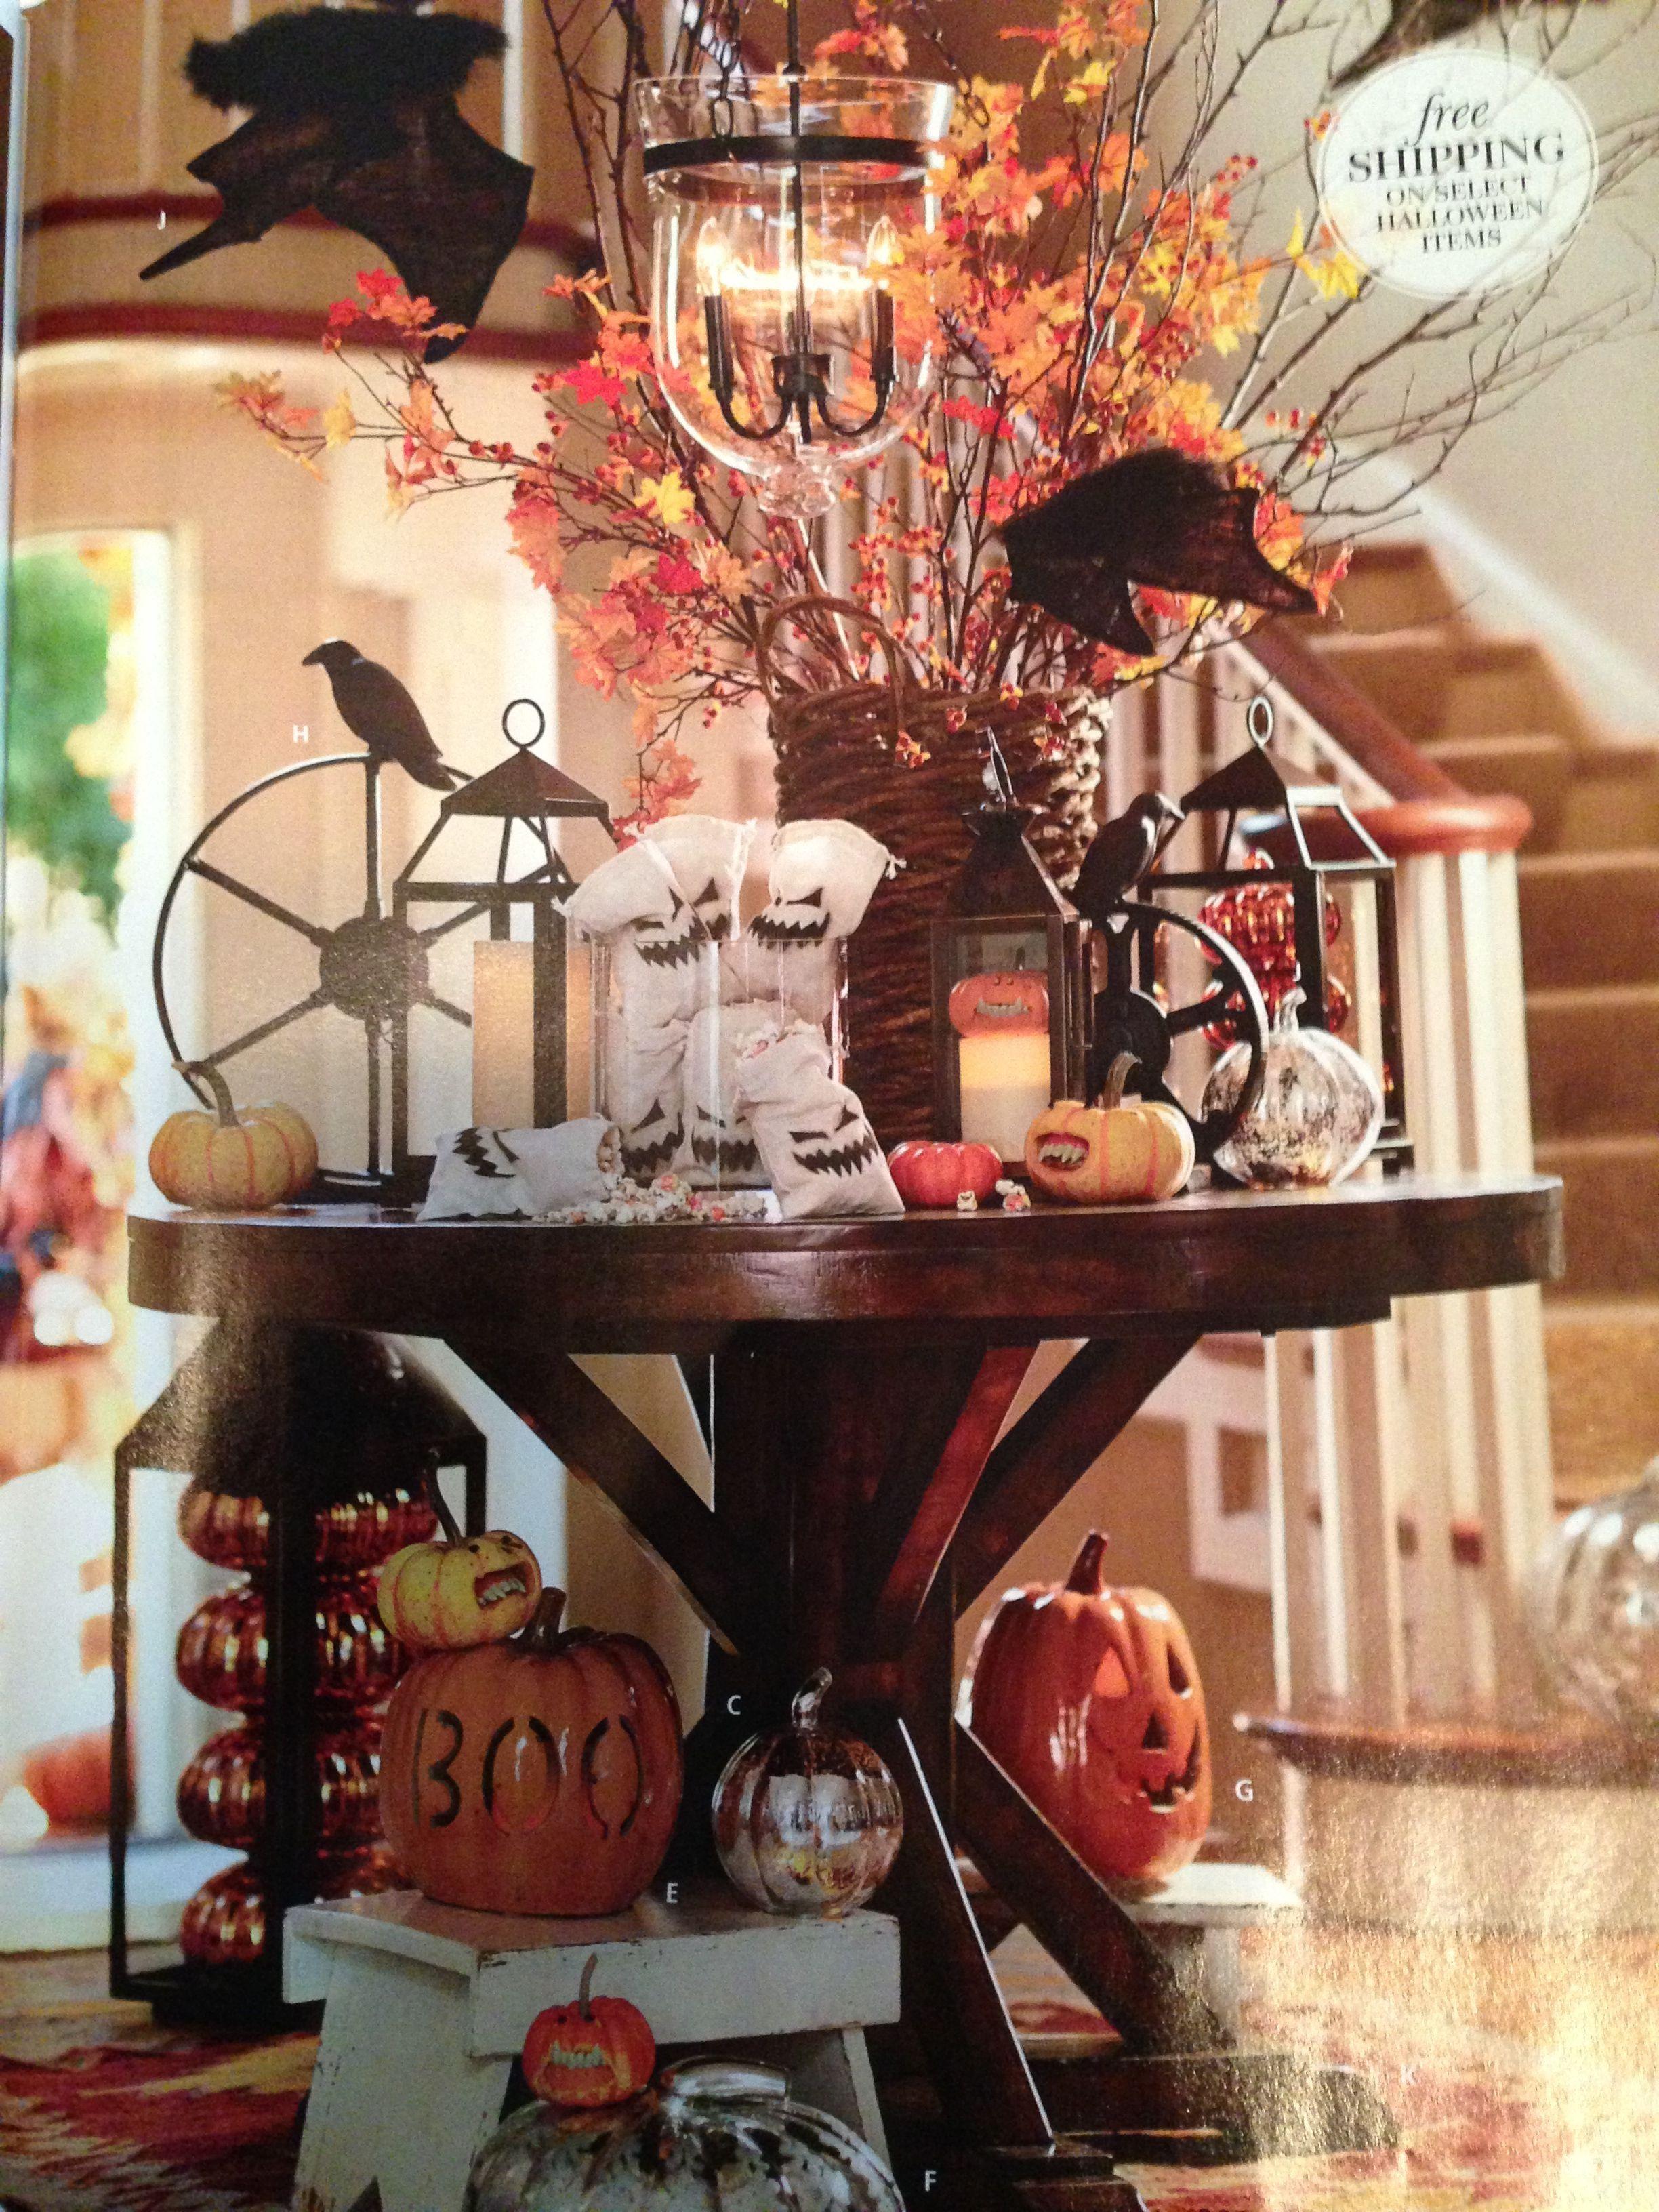 15 Pottery Barn Halloween Decorations Pottery barn